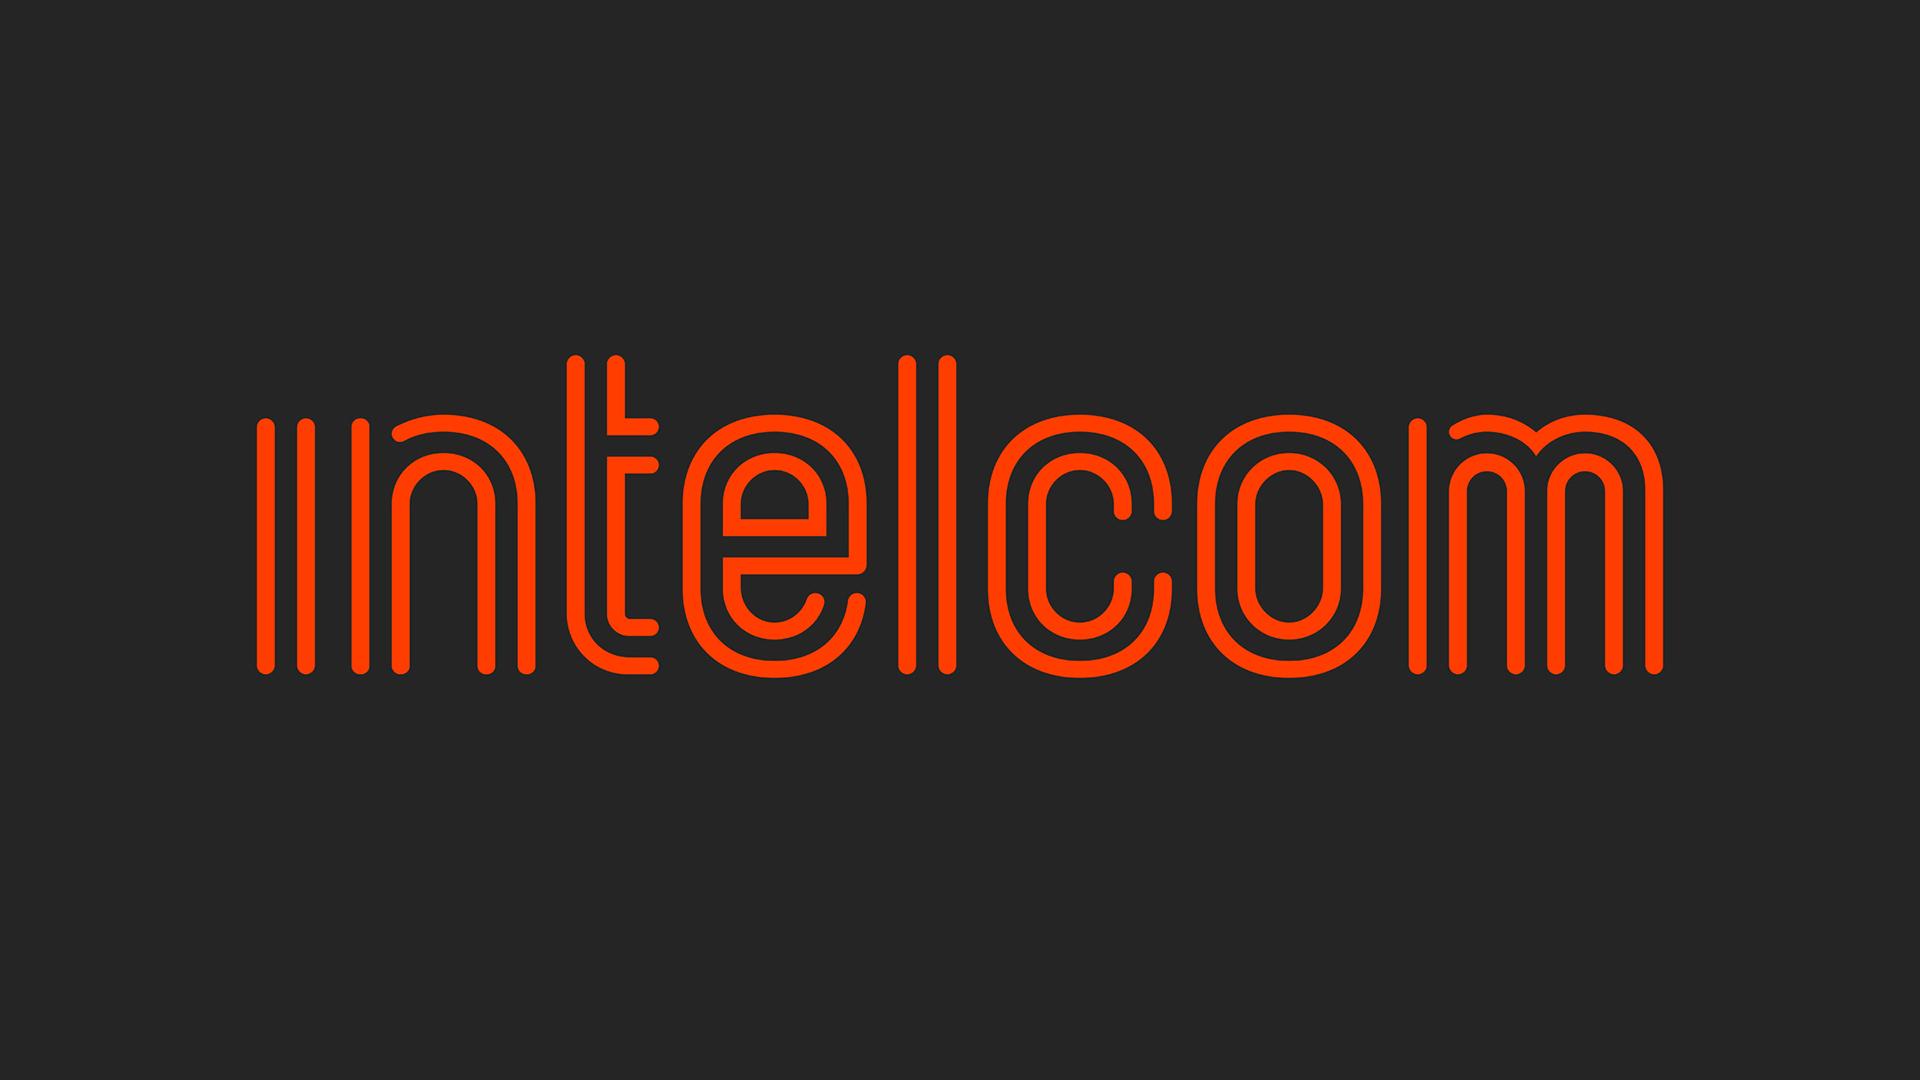 Logo Intelcom 1920X1080